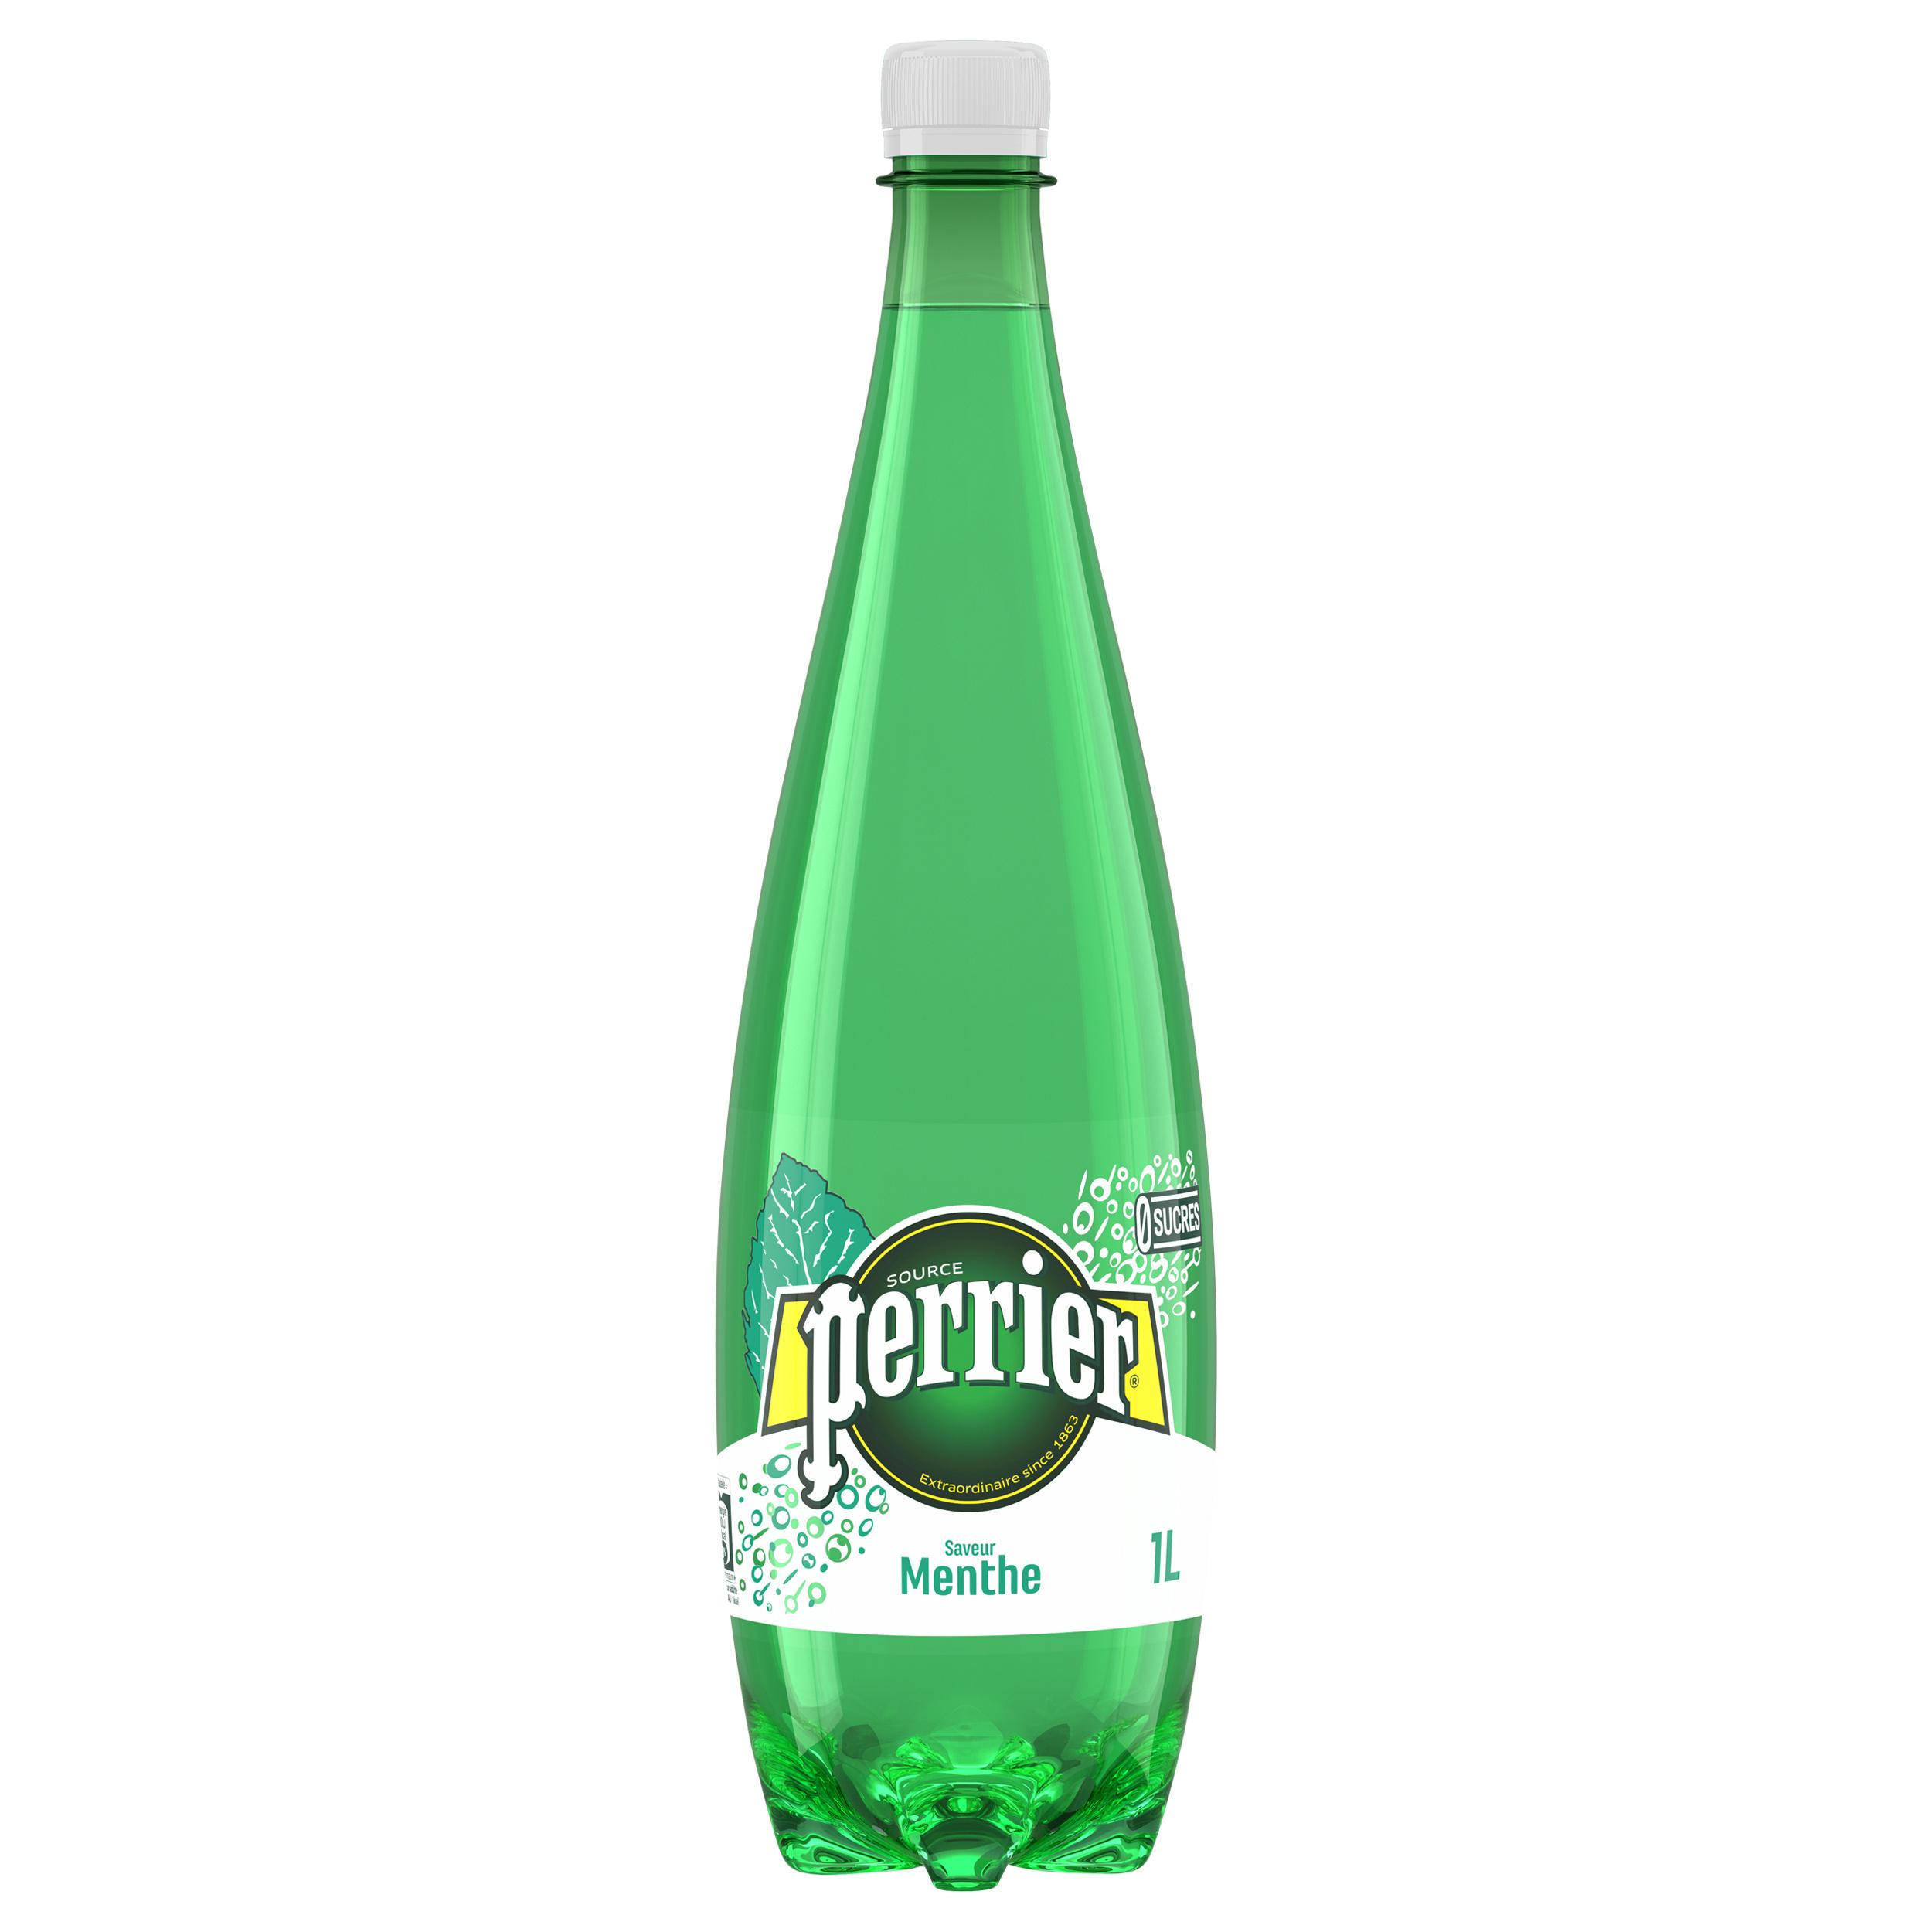 eau-minerale-chantemerle enceinte